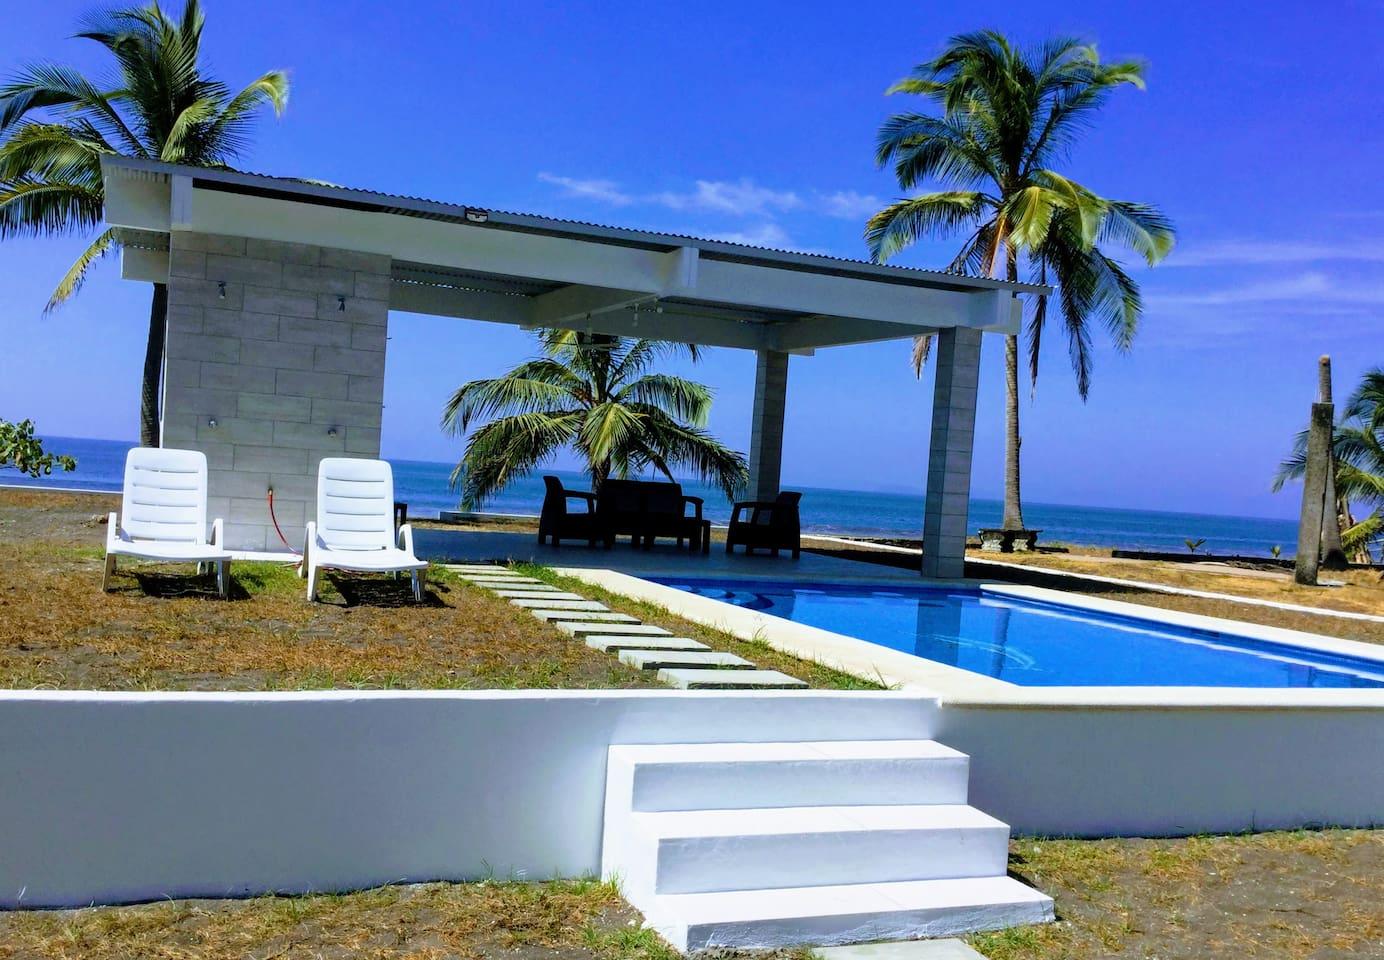 Swimming pool overlooking the ocean!